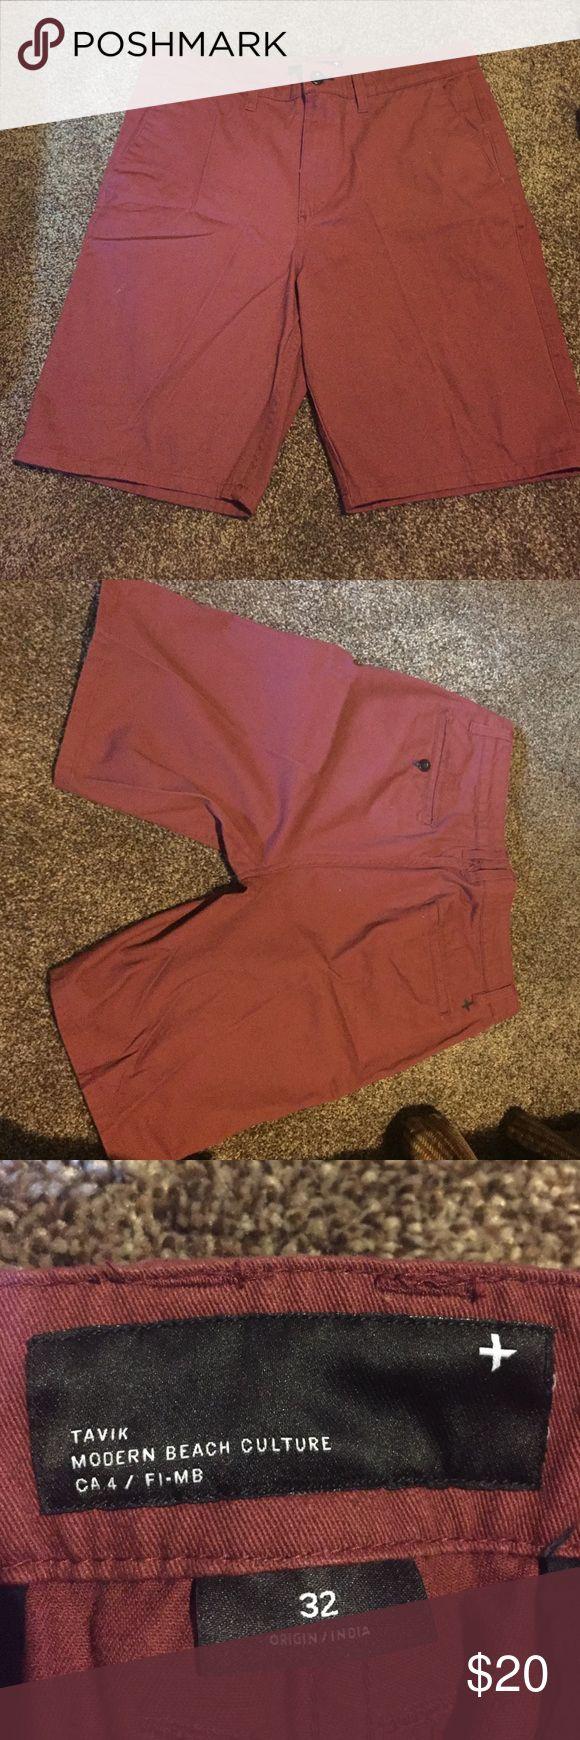 Maroon shorts Never worn maroon shorts Tavik Shorts Flat Front